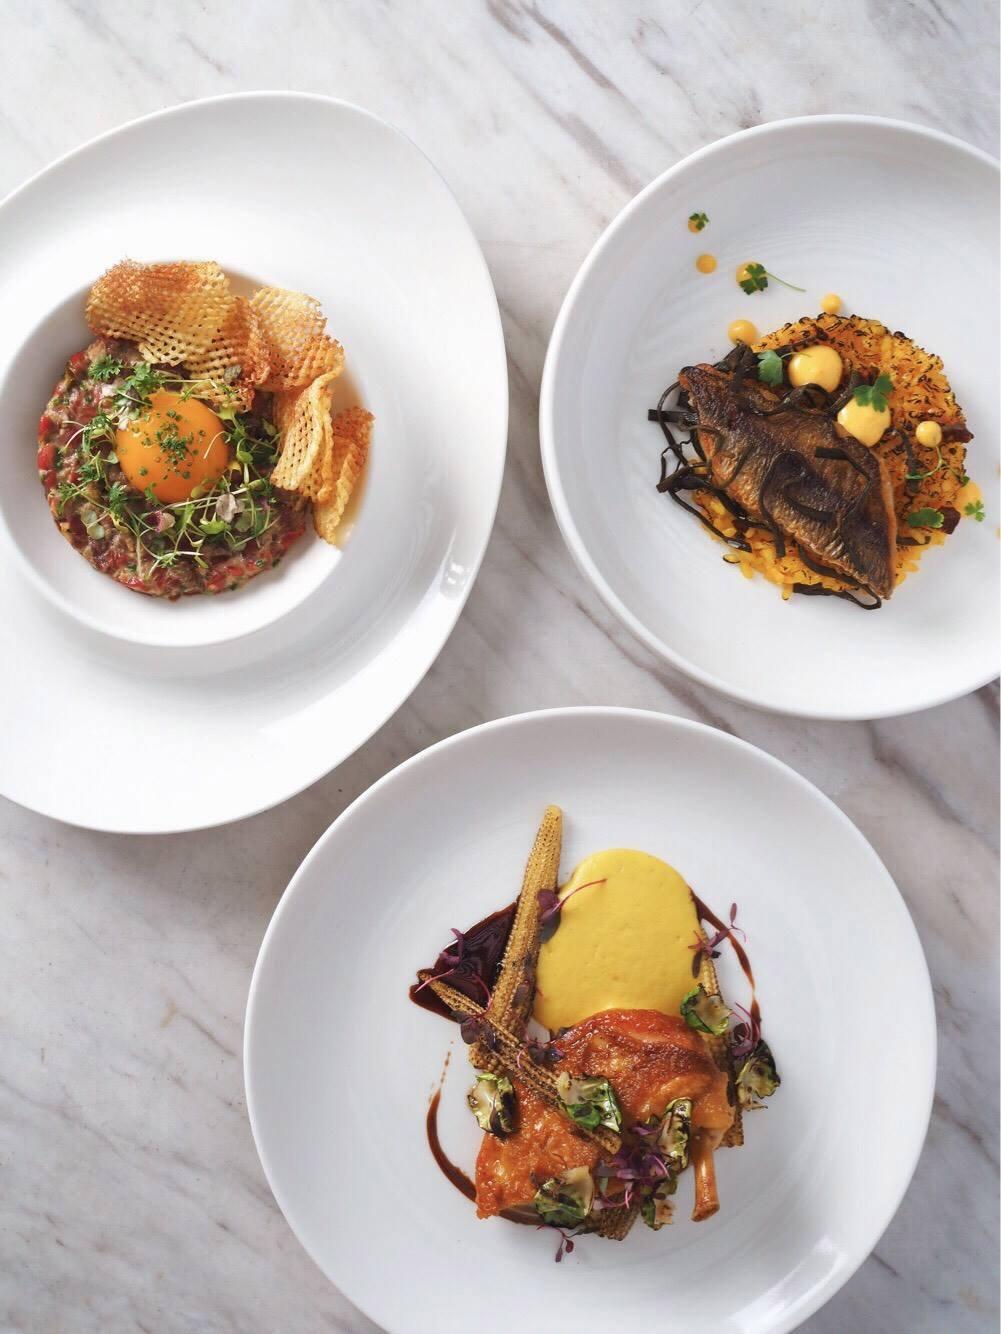 Dempsey Hil Restaurants - The White Rabbit food